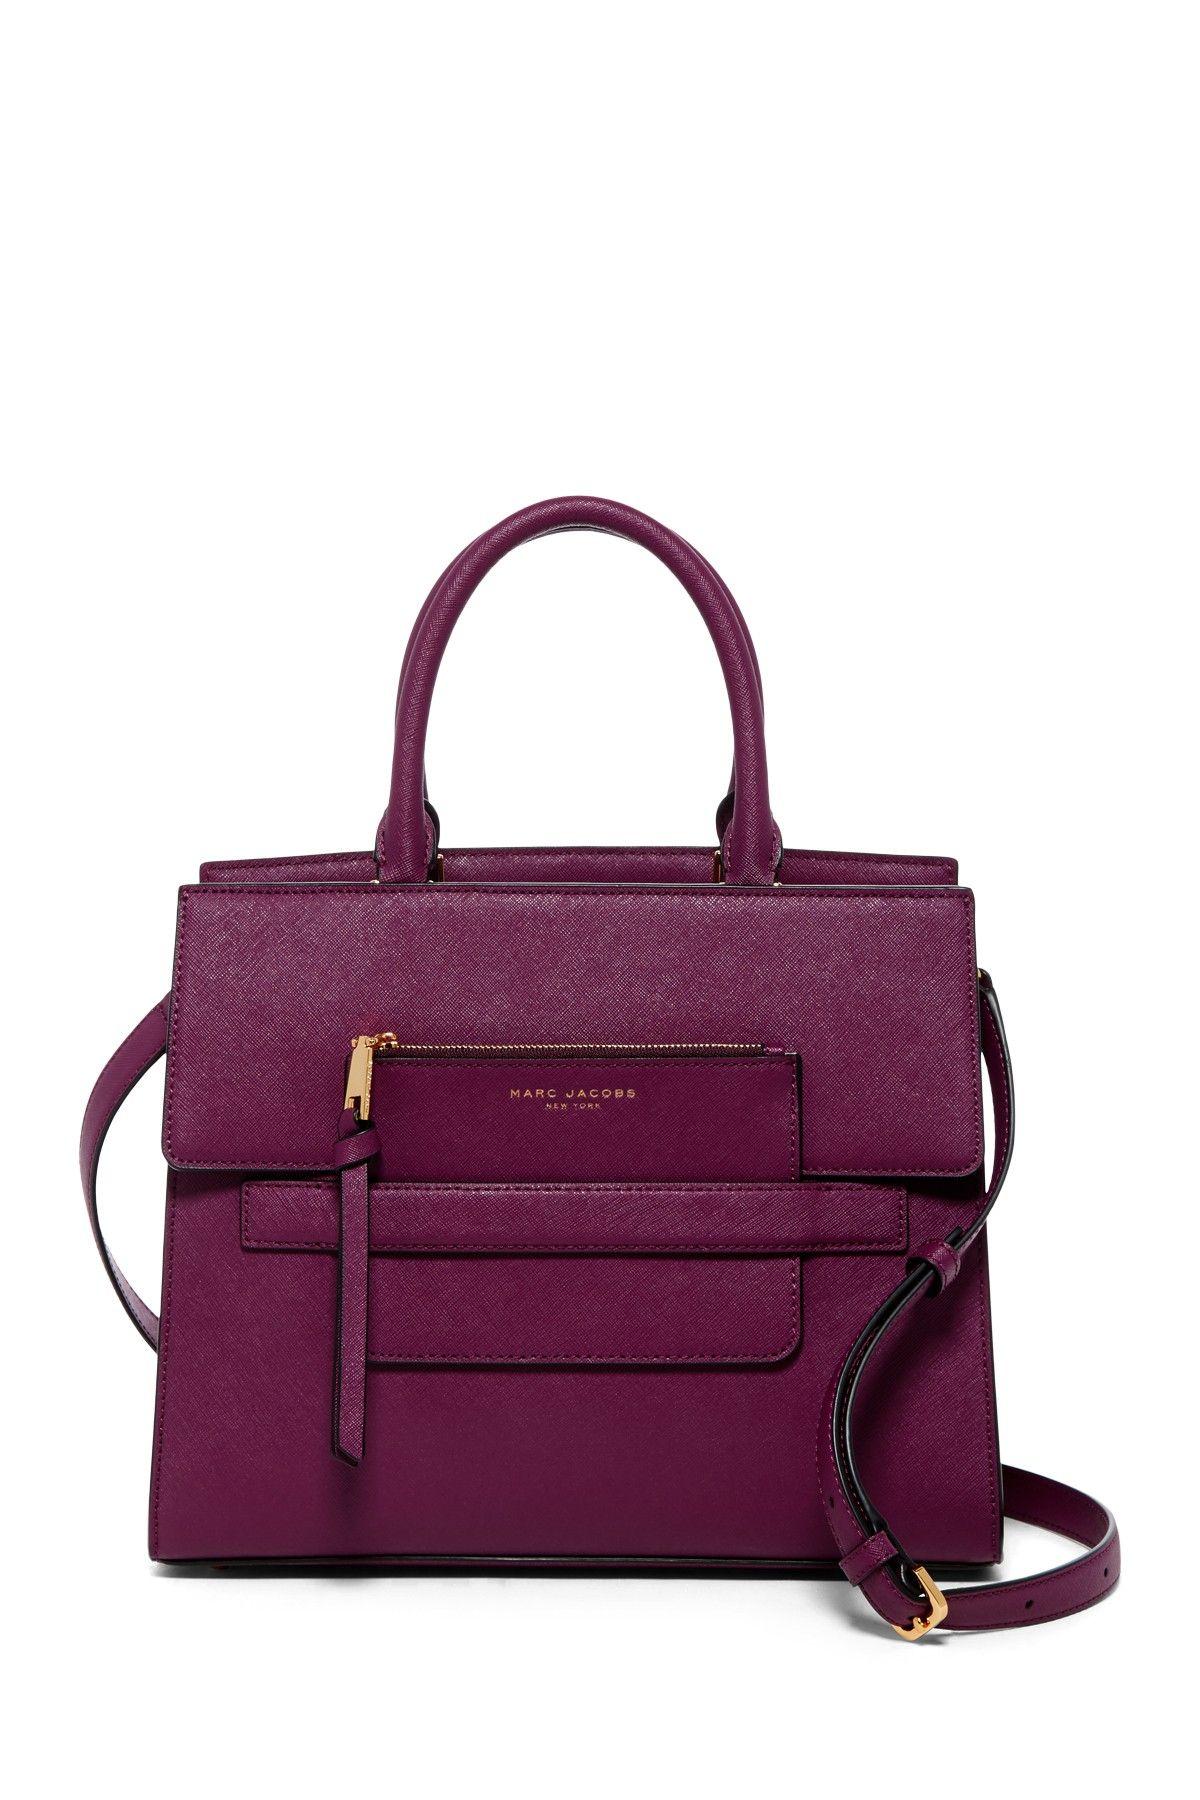 2dea85c5932b Madison Saffiano Leather Crossbody Bag   Pouch Purple Handbags